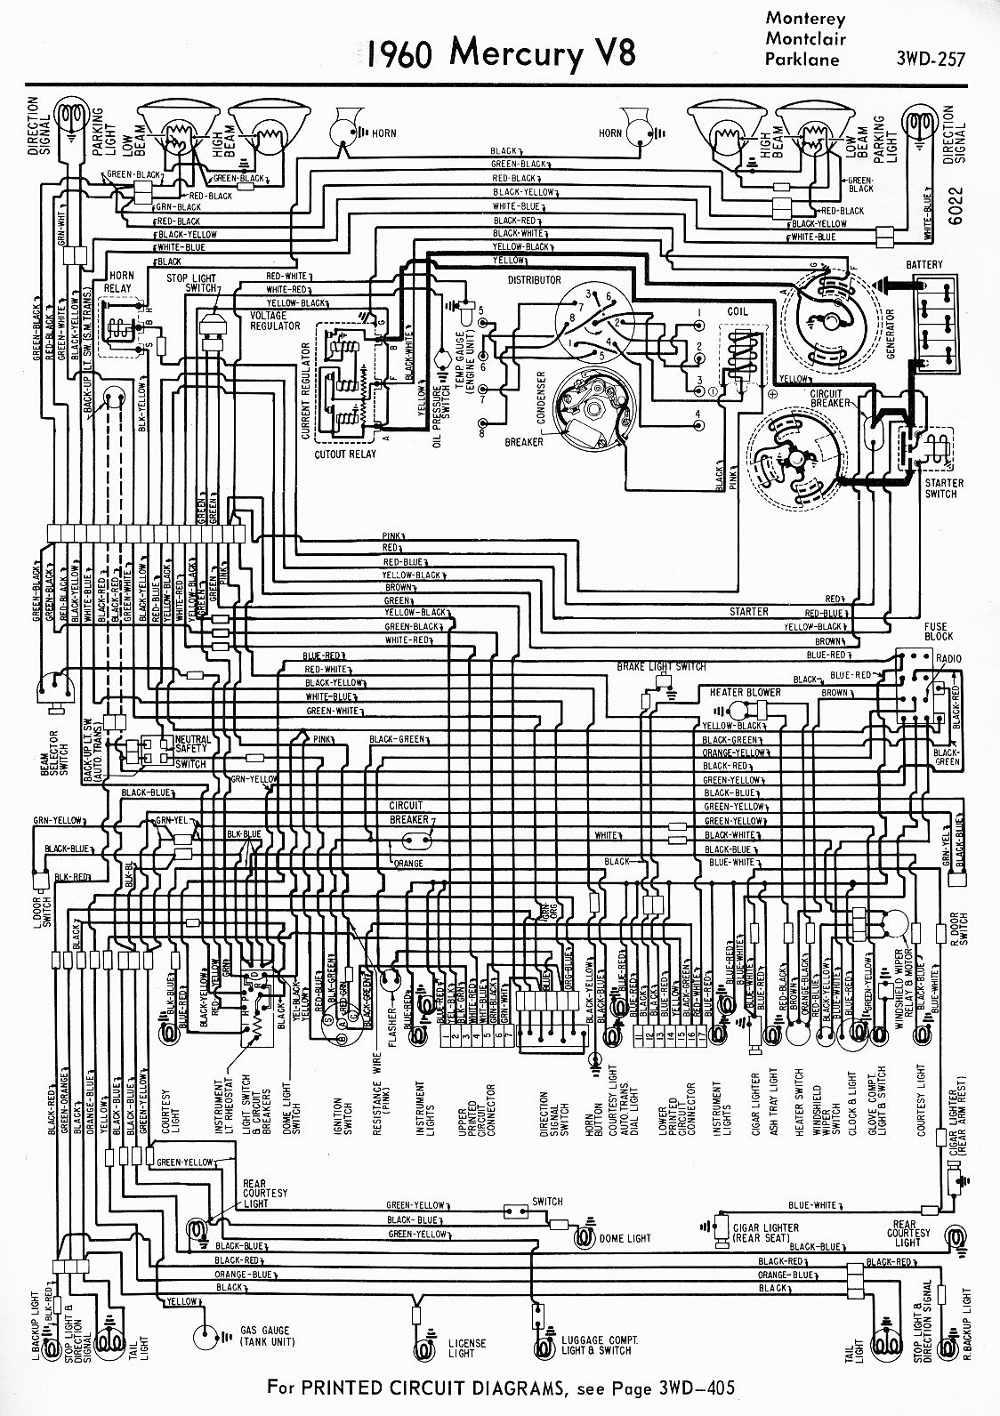 Mercury monterey wiring diagram wiring data u maxi mail co mercury outboard  wiring jpg 1000x1416 1963